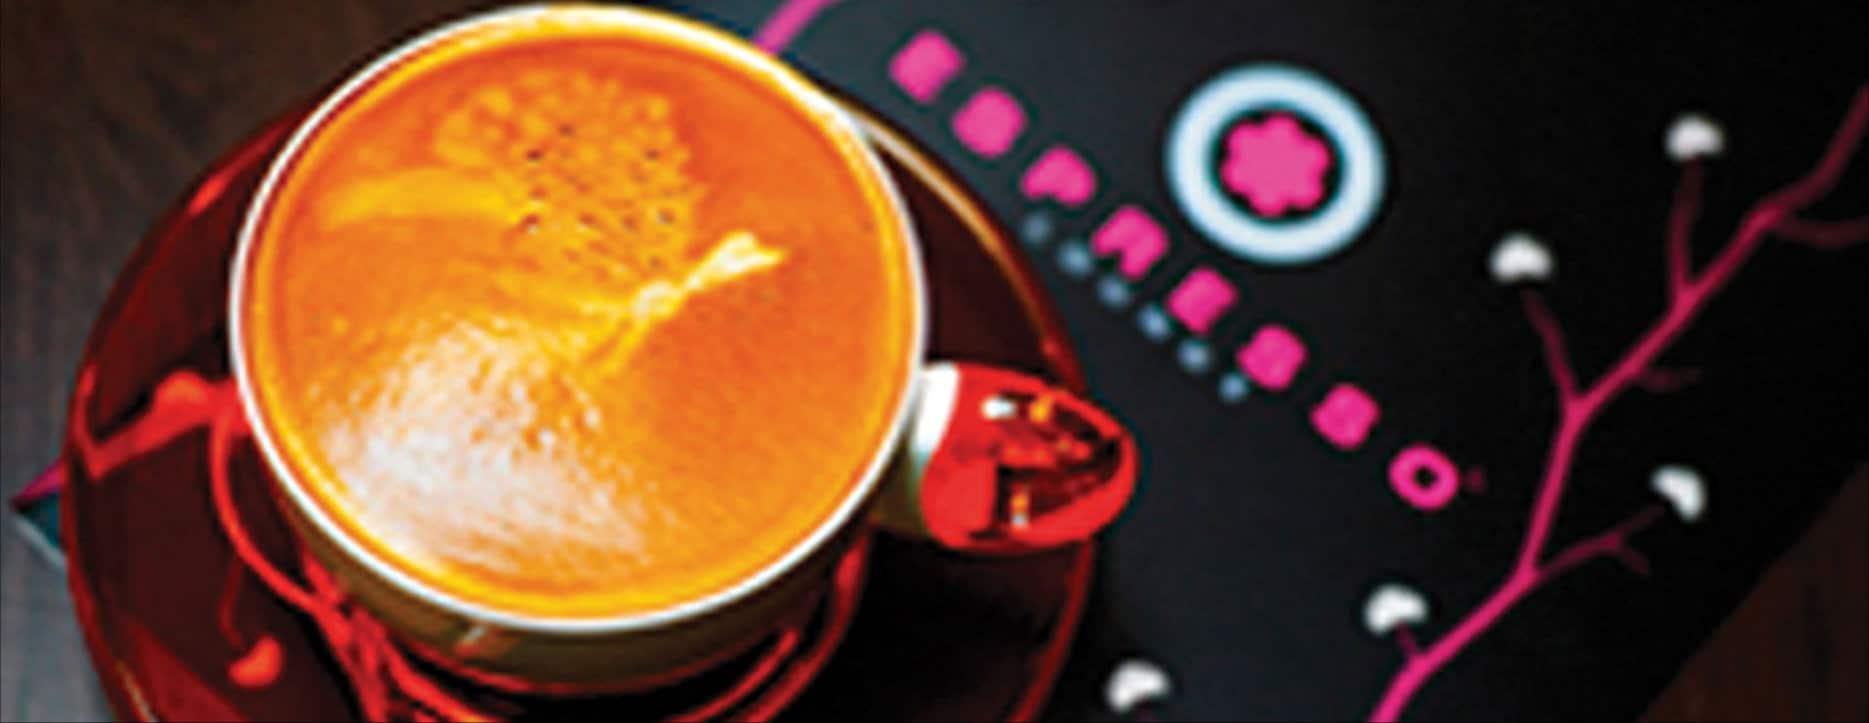 espresso_main2